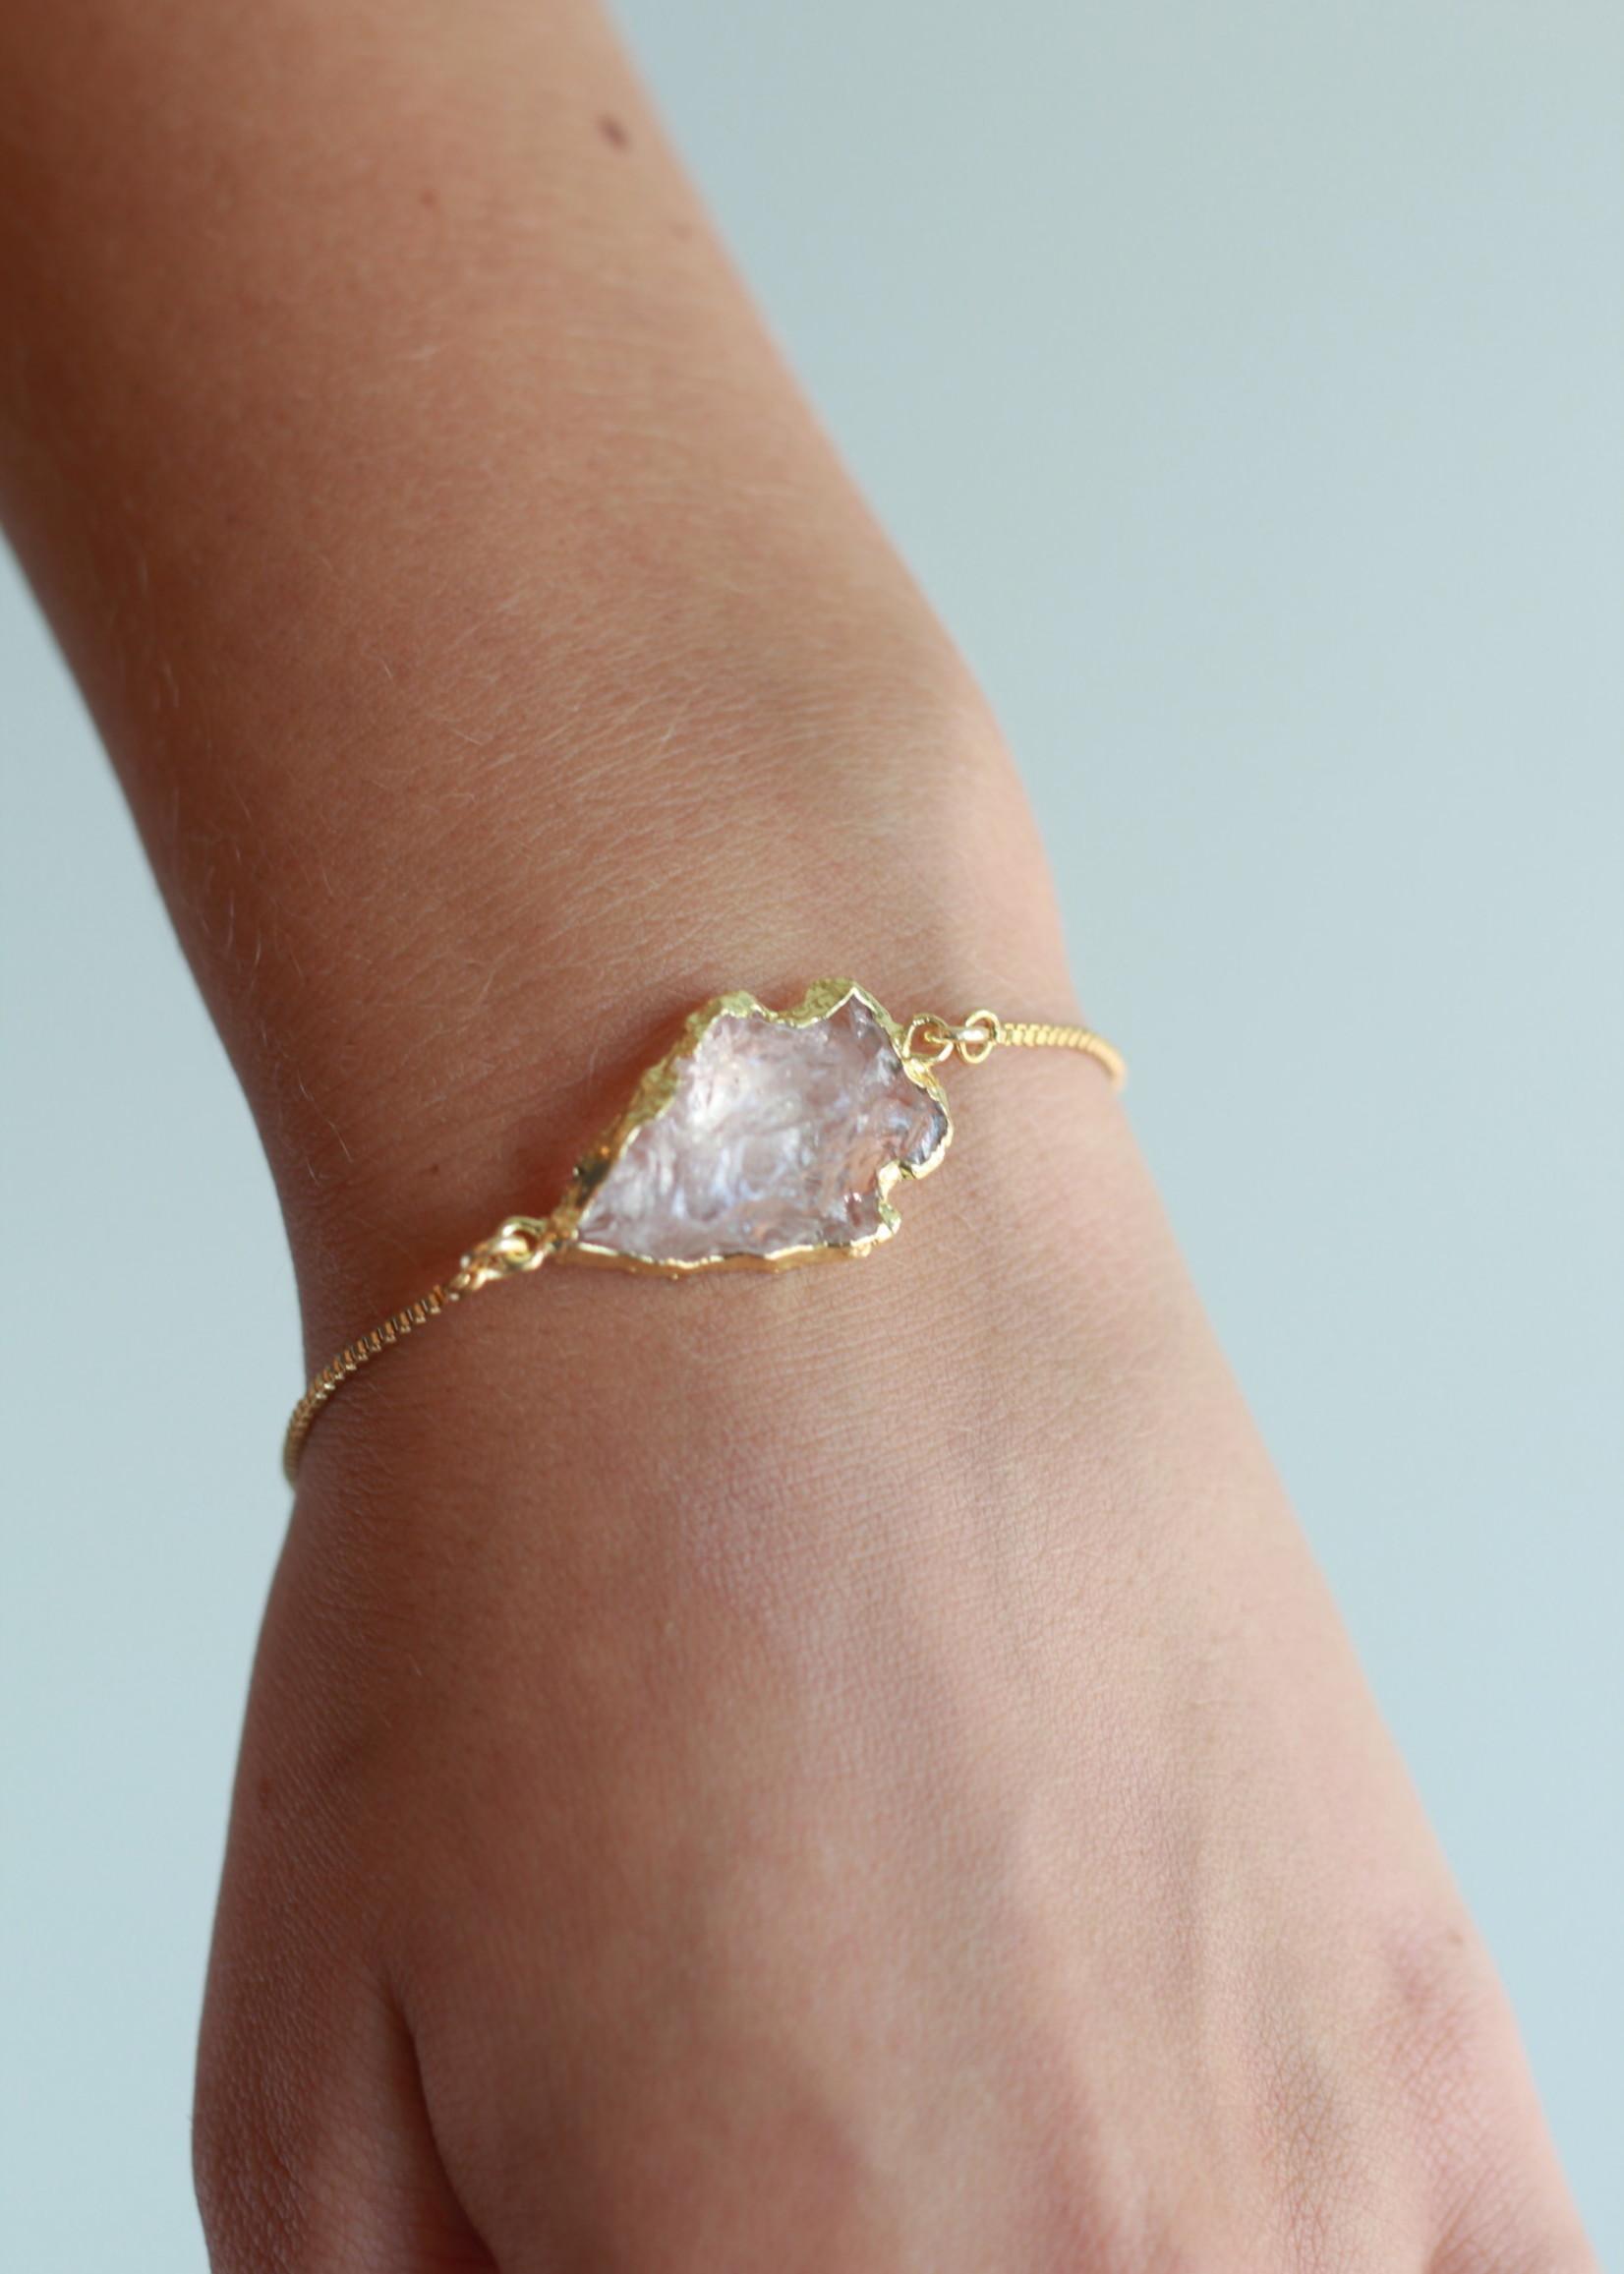 Allison Conway AC Clear Arrowhead Bracelet